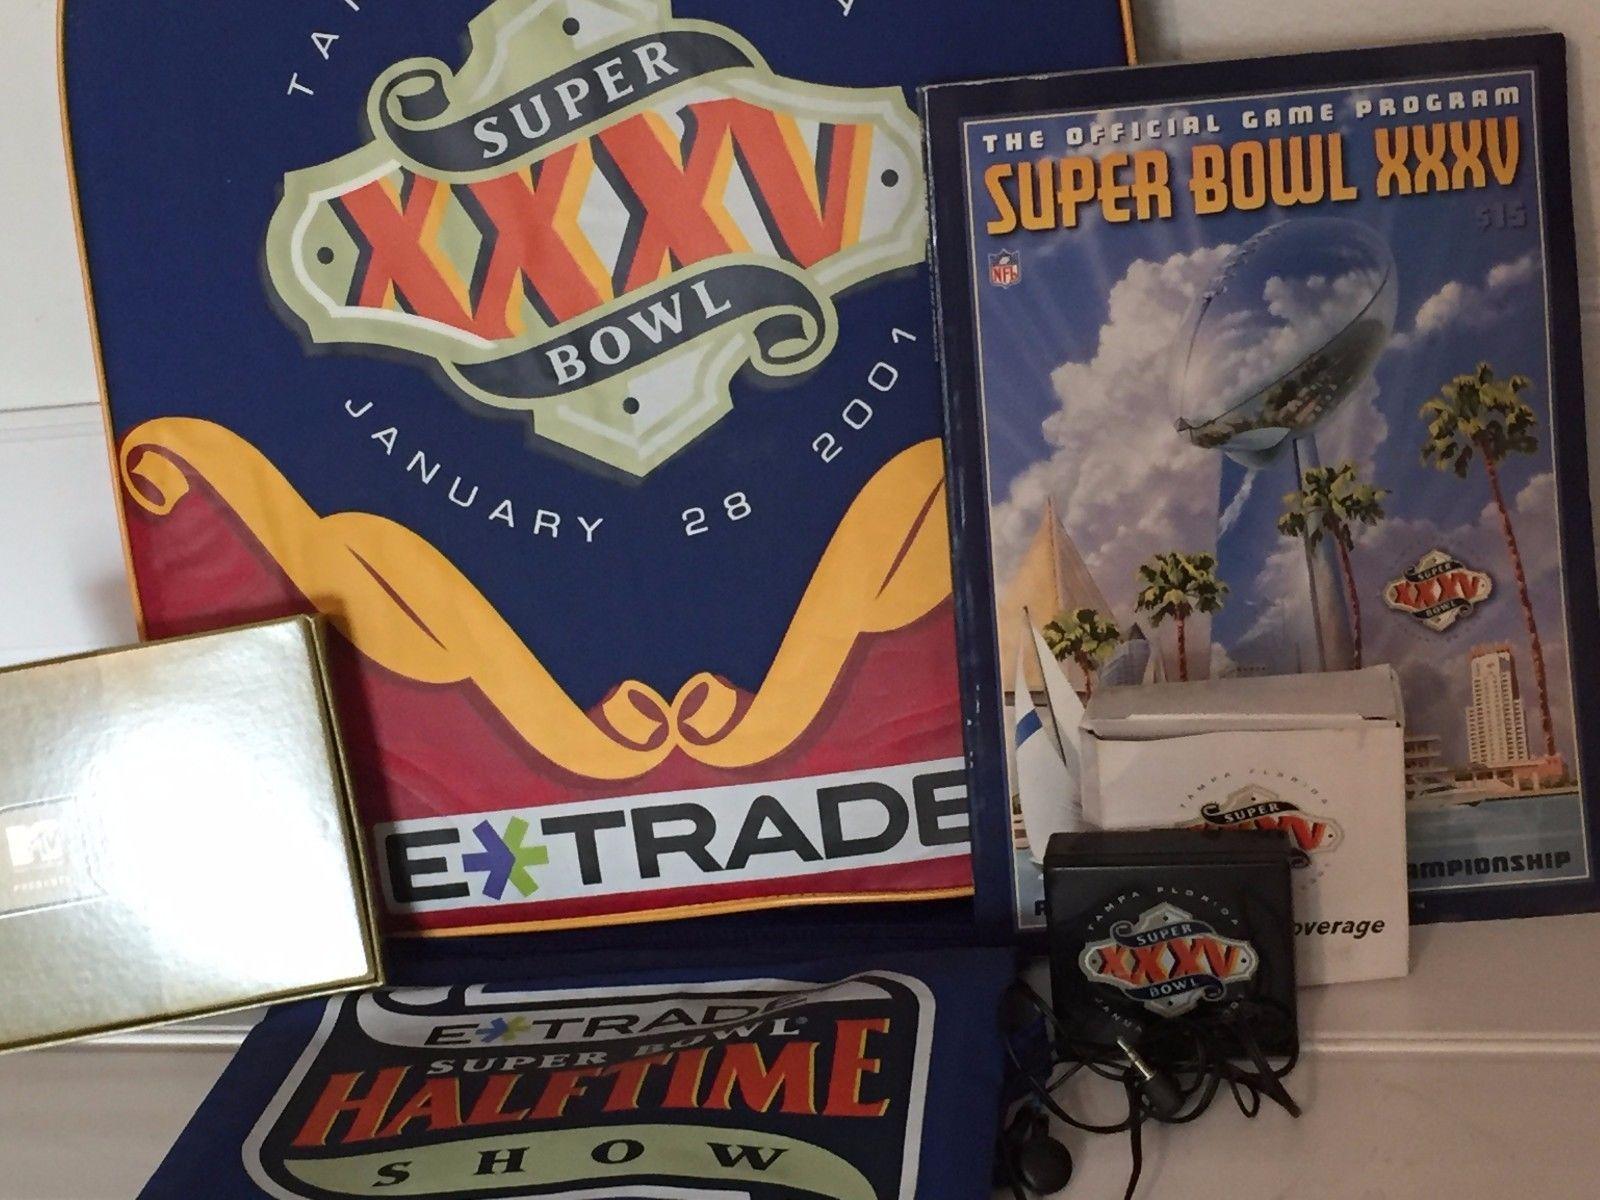 Superbowl xxxv 2001 Seat Lot Souvenir Program Football  image 2